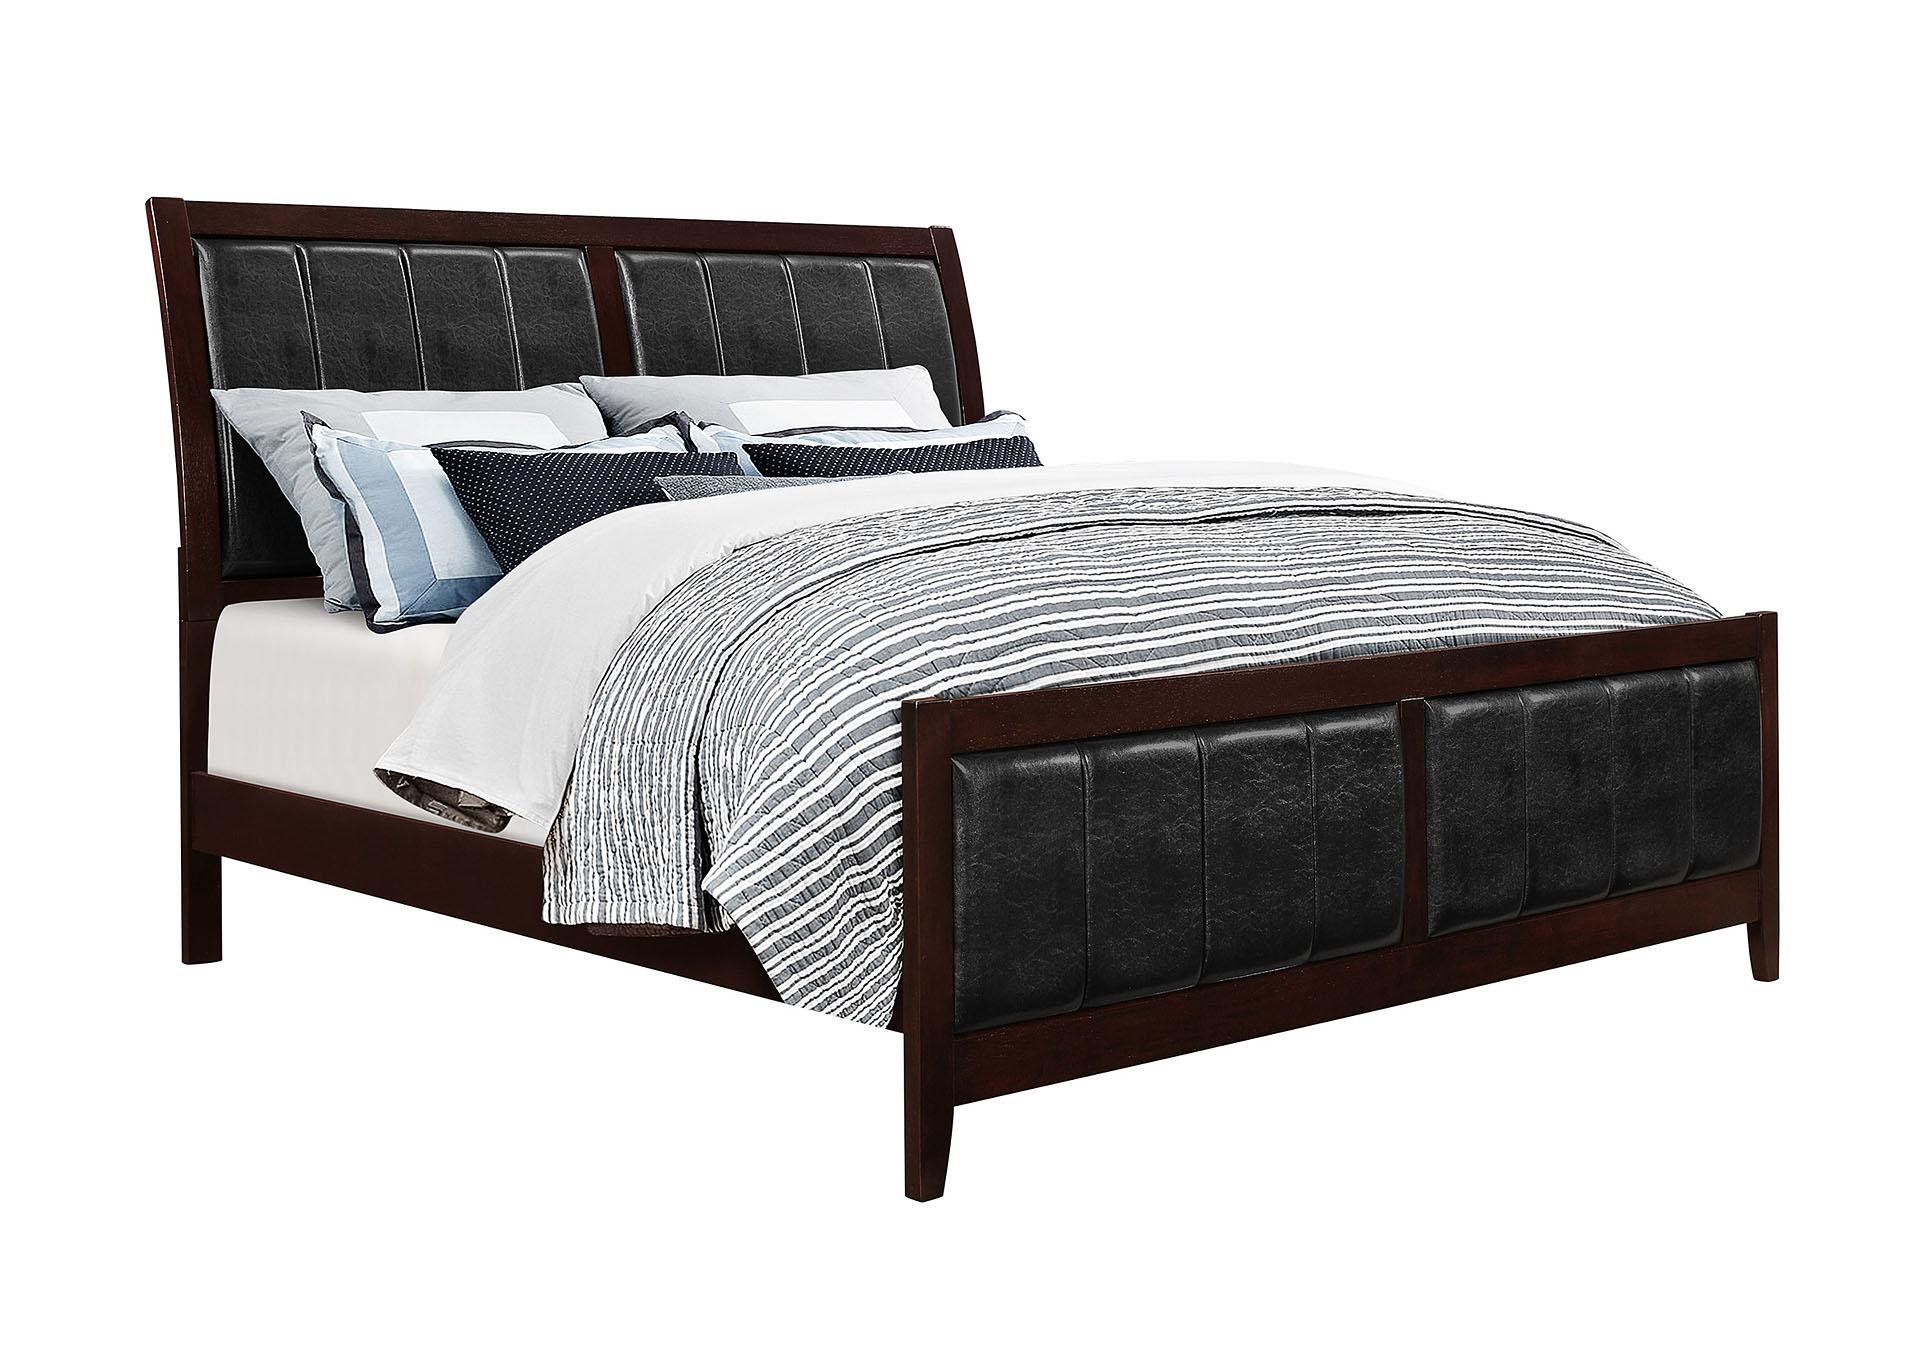 Overstock Furniture - Langley Park, Catonsville, Alexandria ...